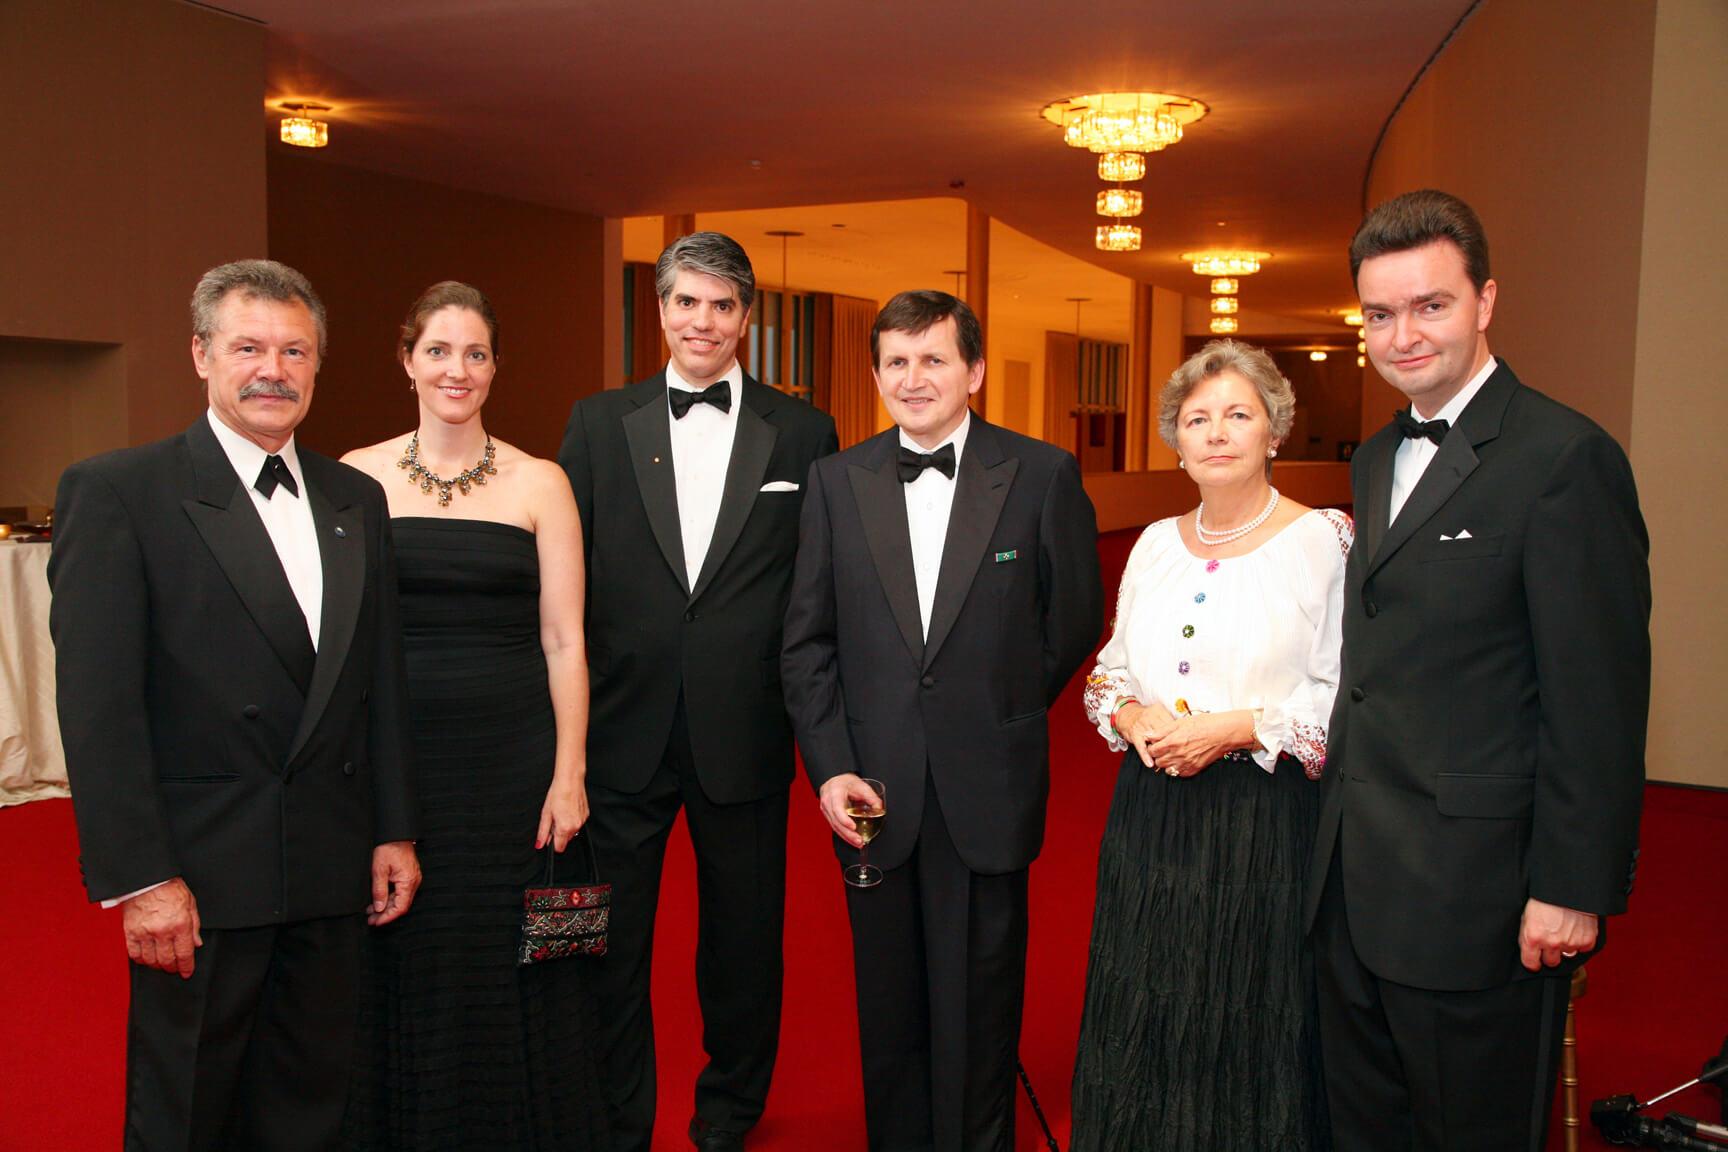 Mr. Bertalan Farkas, Mrs. Wendy Jagerson Teleki, Mr. Maximilian Teleki, and Dr. Charles Simonyi, Mrs. Edith Lauer HAC Chair Emerita, and Ambassador Georg von Habsburg